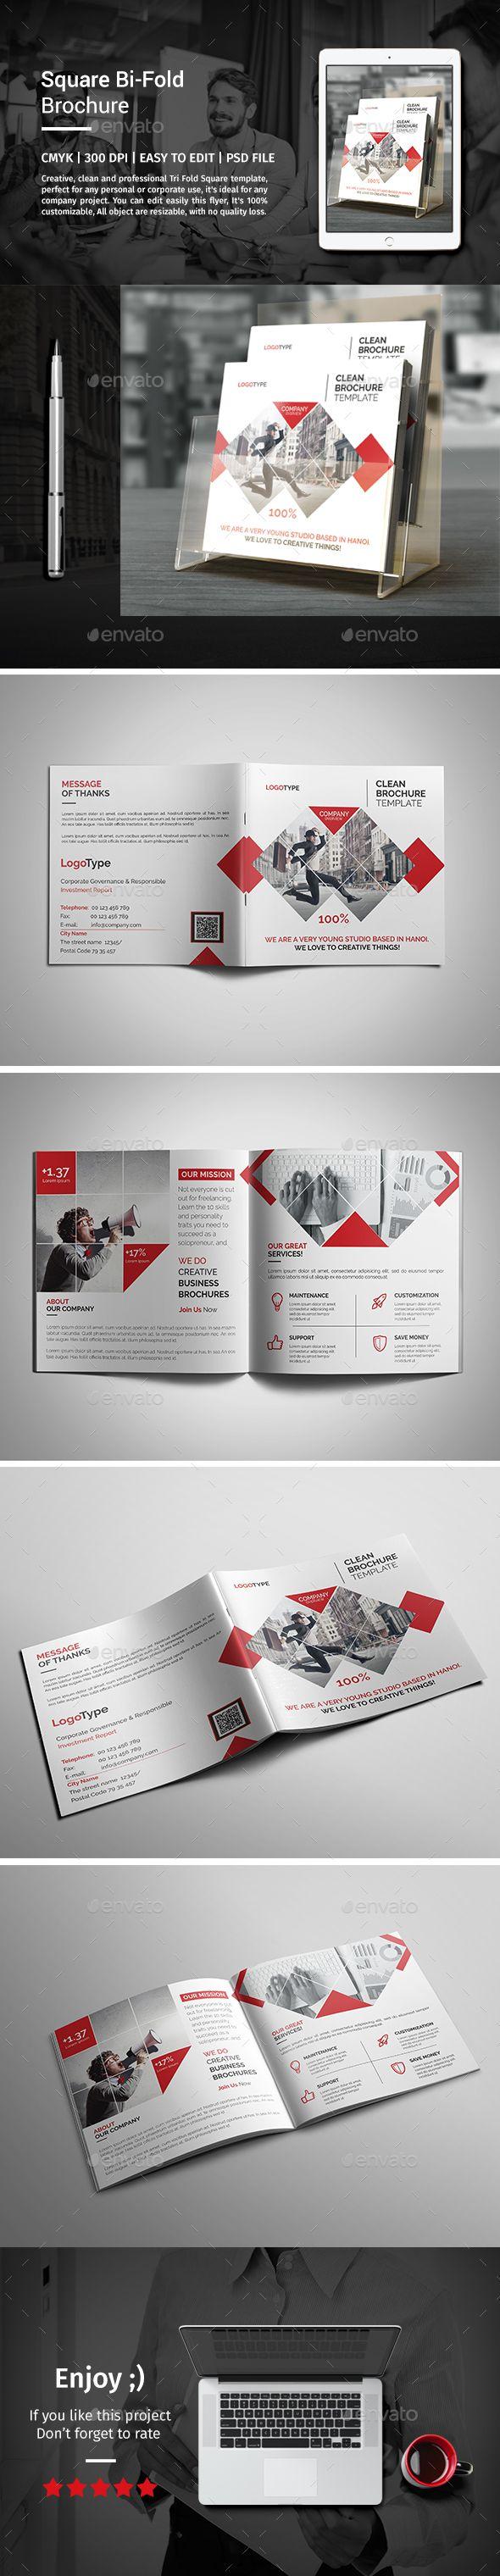 corporate bi fold square brochure 03 パンフレットのテンプレート